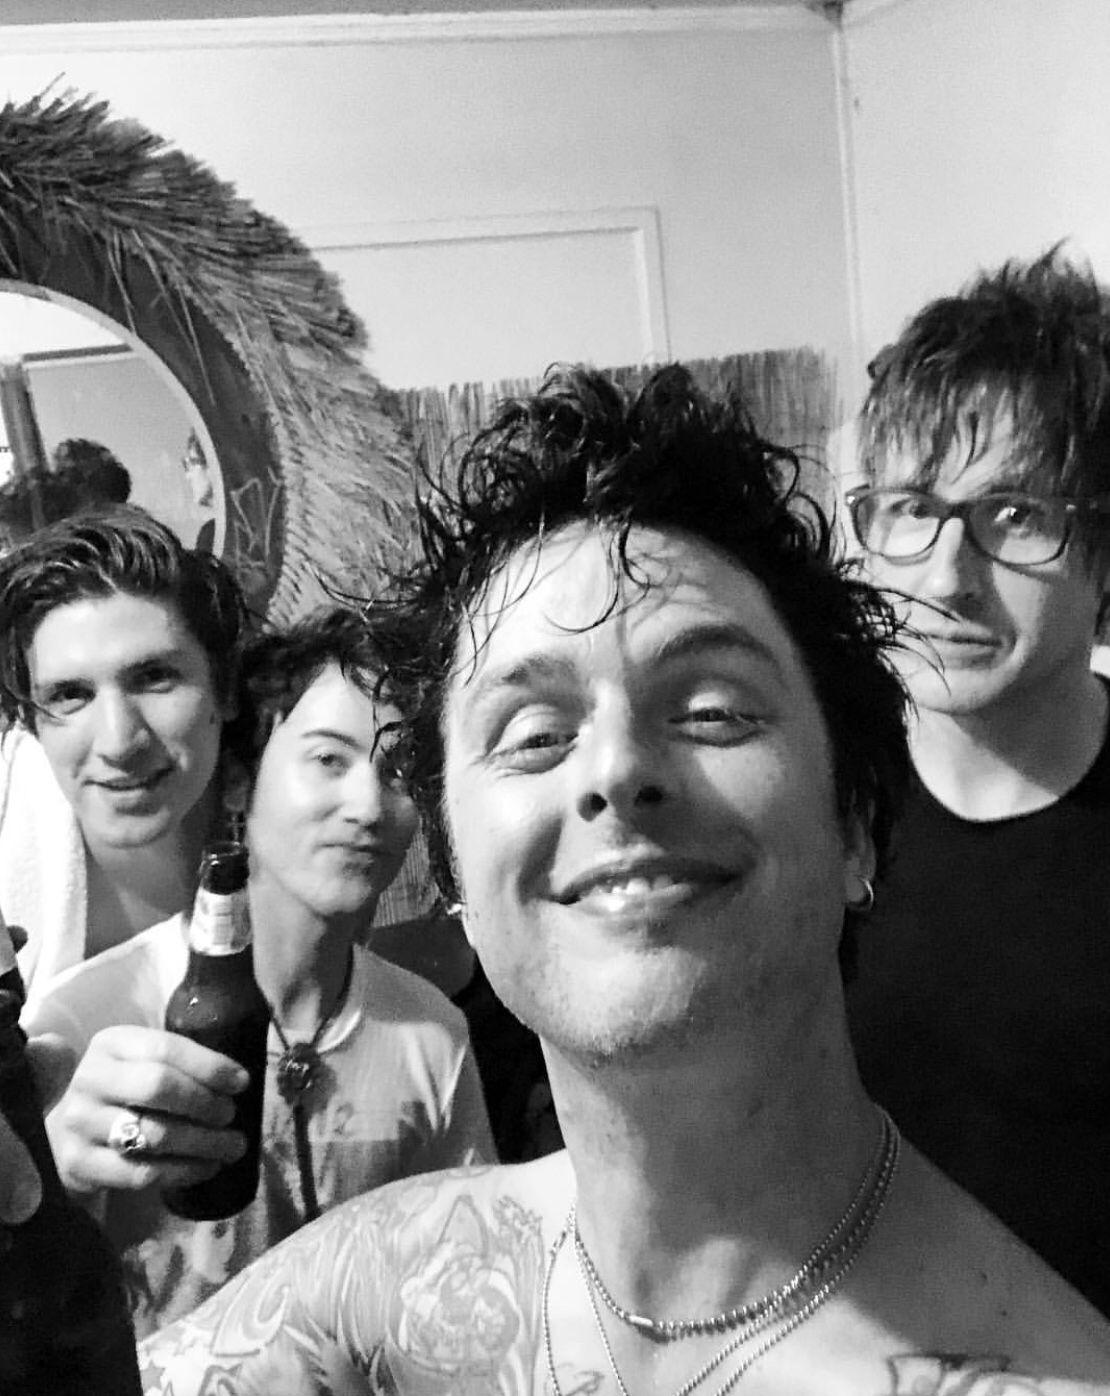 Pin by Edina Fricsné on Green Day | Green day, Billie joe